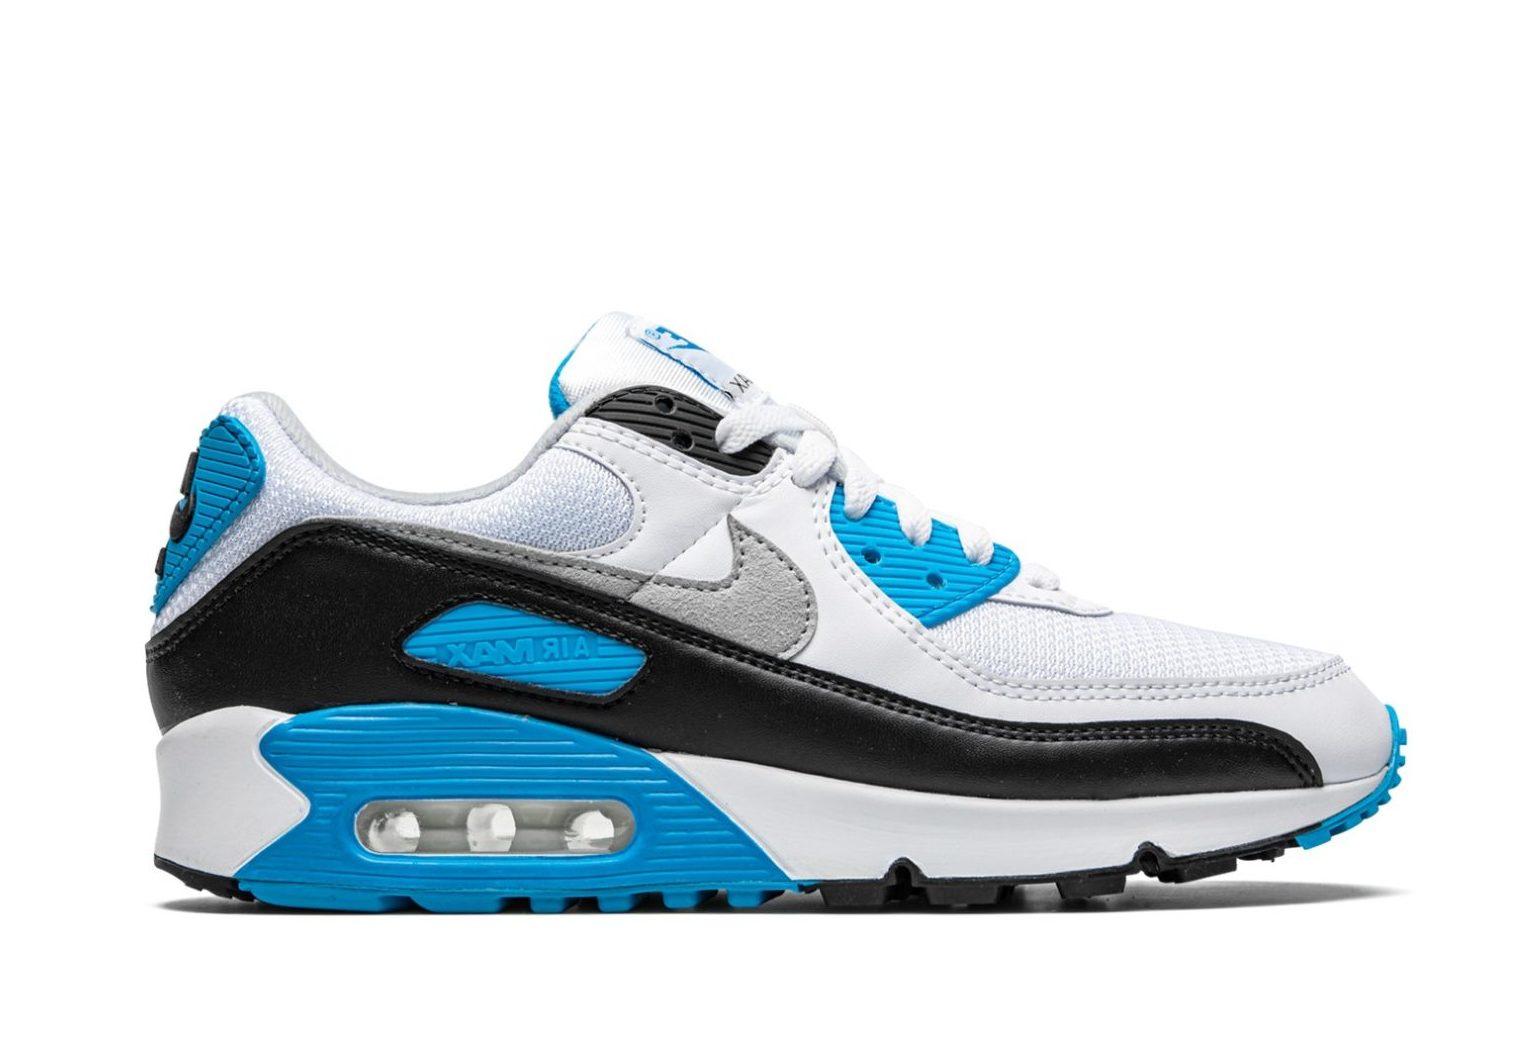 4Krossovki-Nike-Air-Max-90-Essential-Laser-Blue-1-scaled-e1625673315570